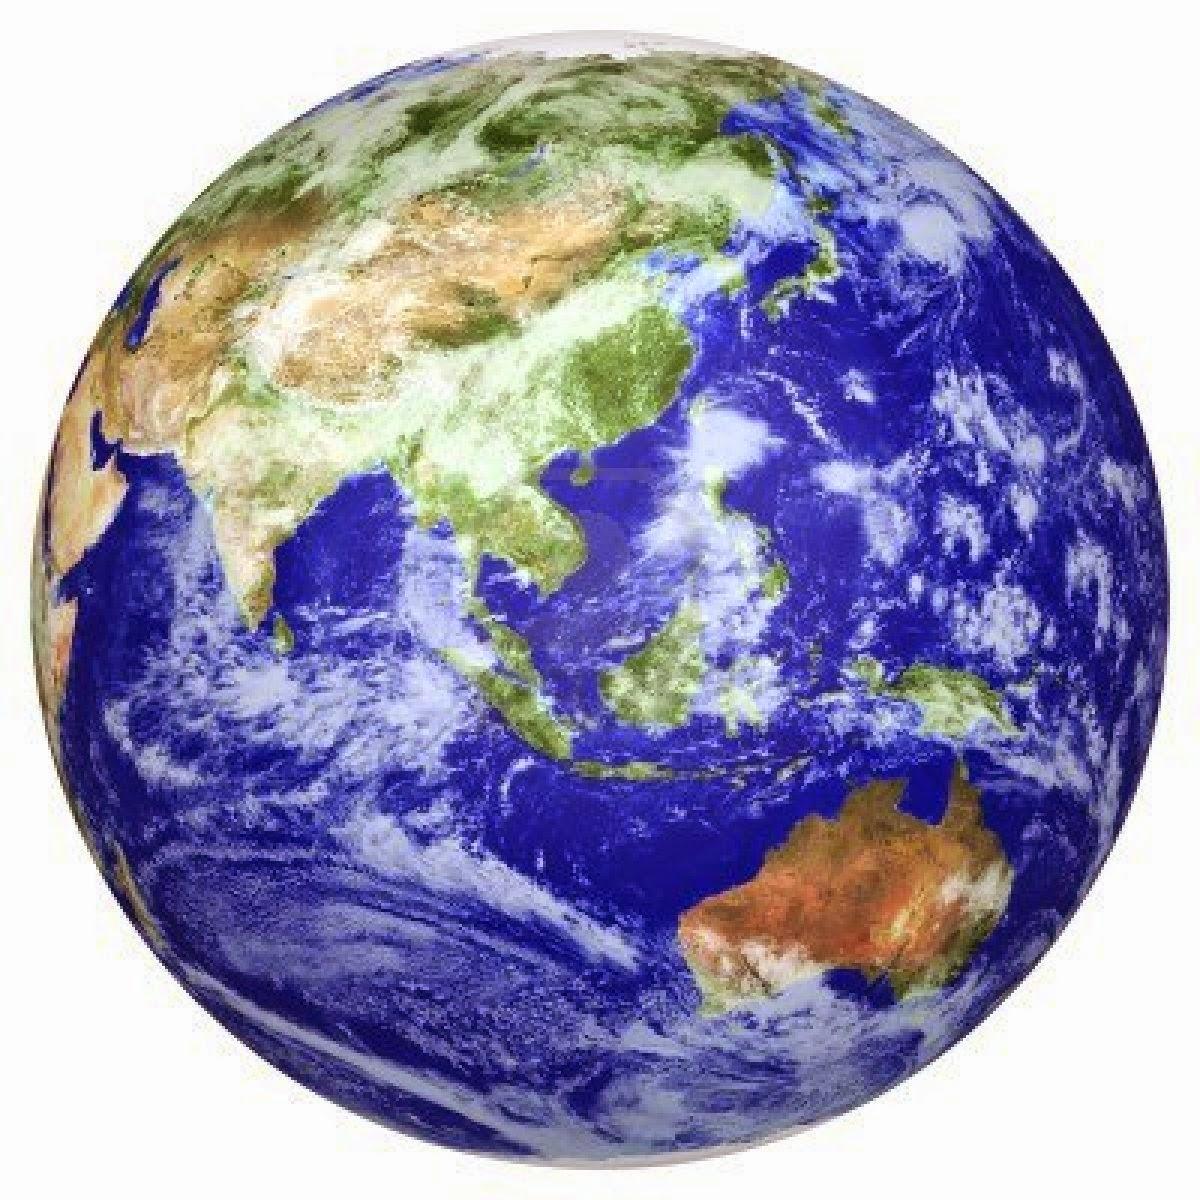 Mengenal Struktur Bumi